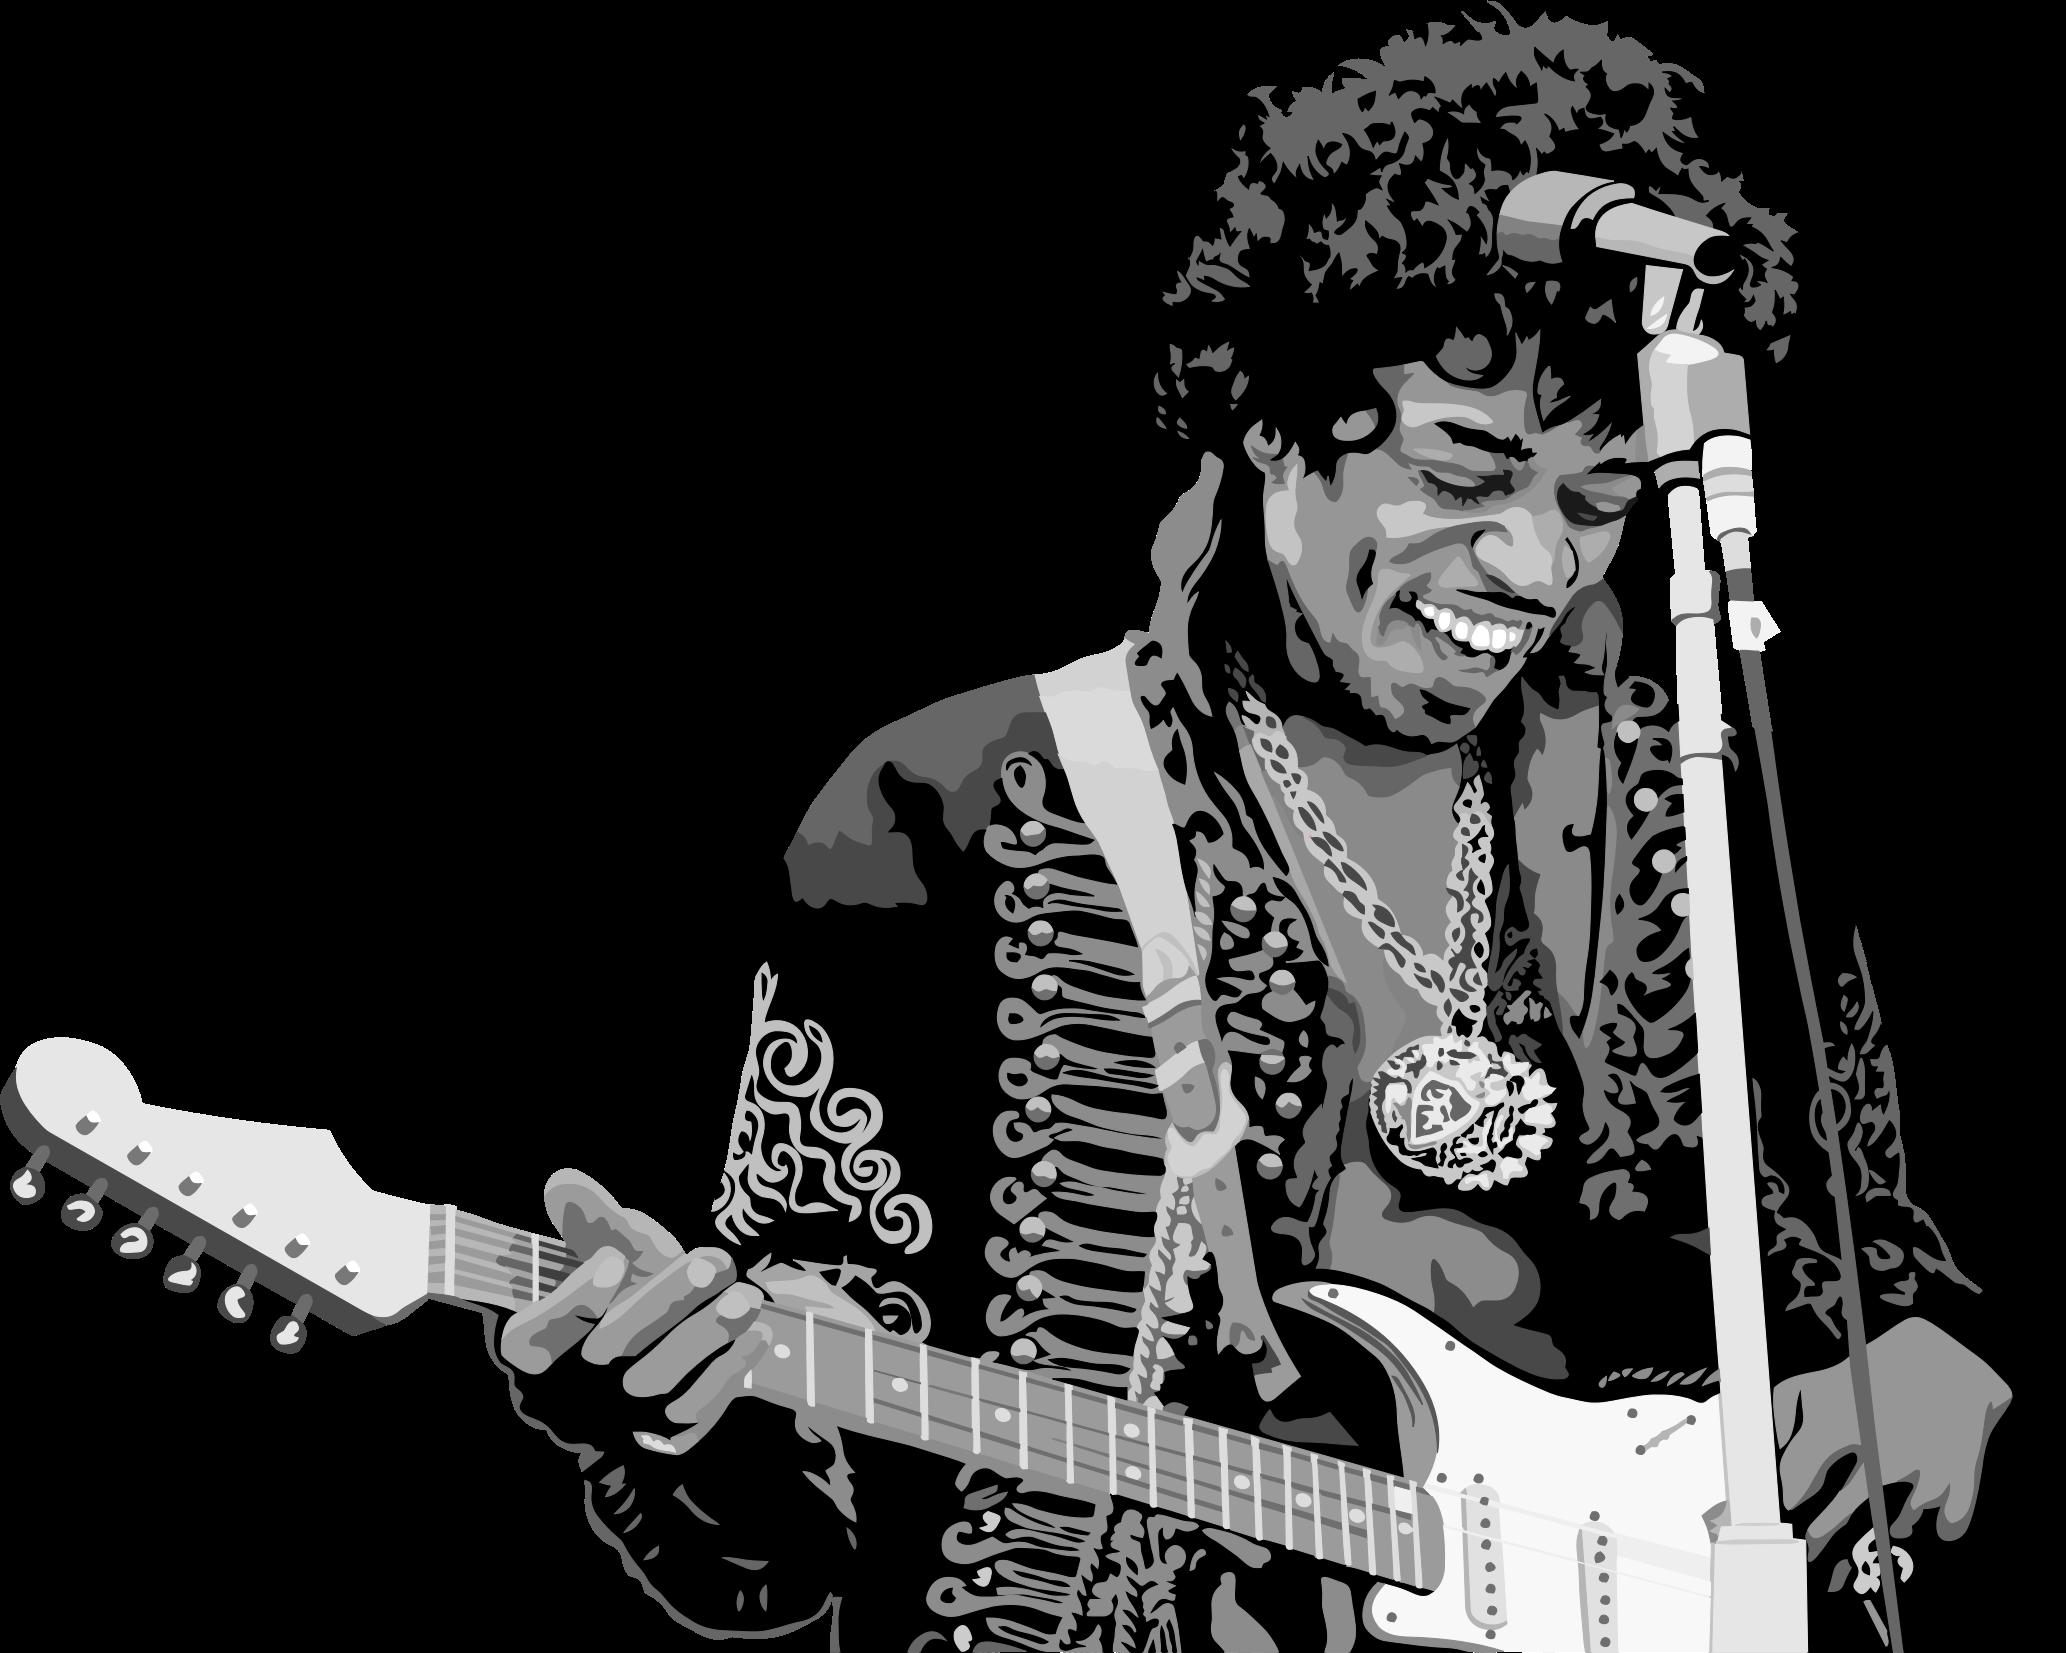 Clipart - Jimi Hendrix Portrait